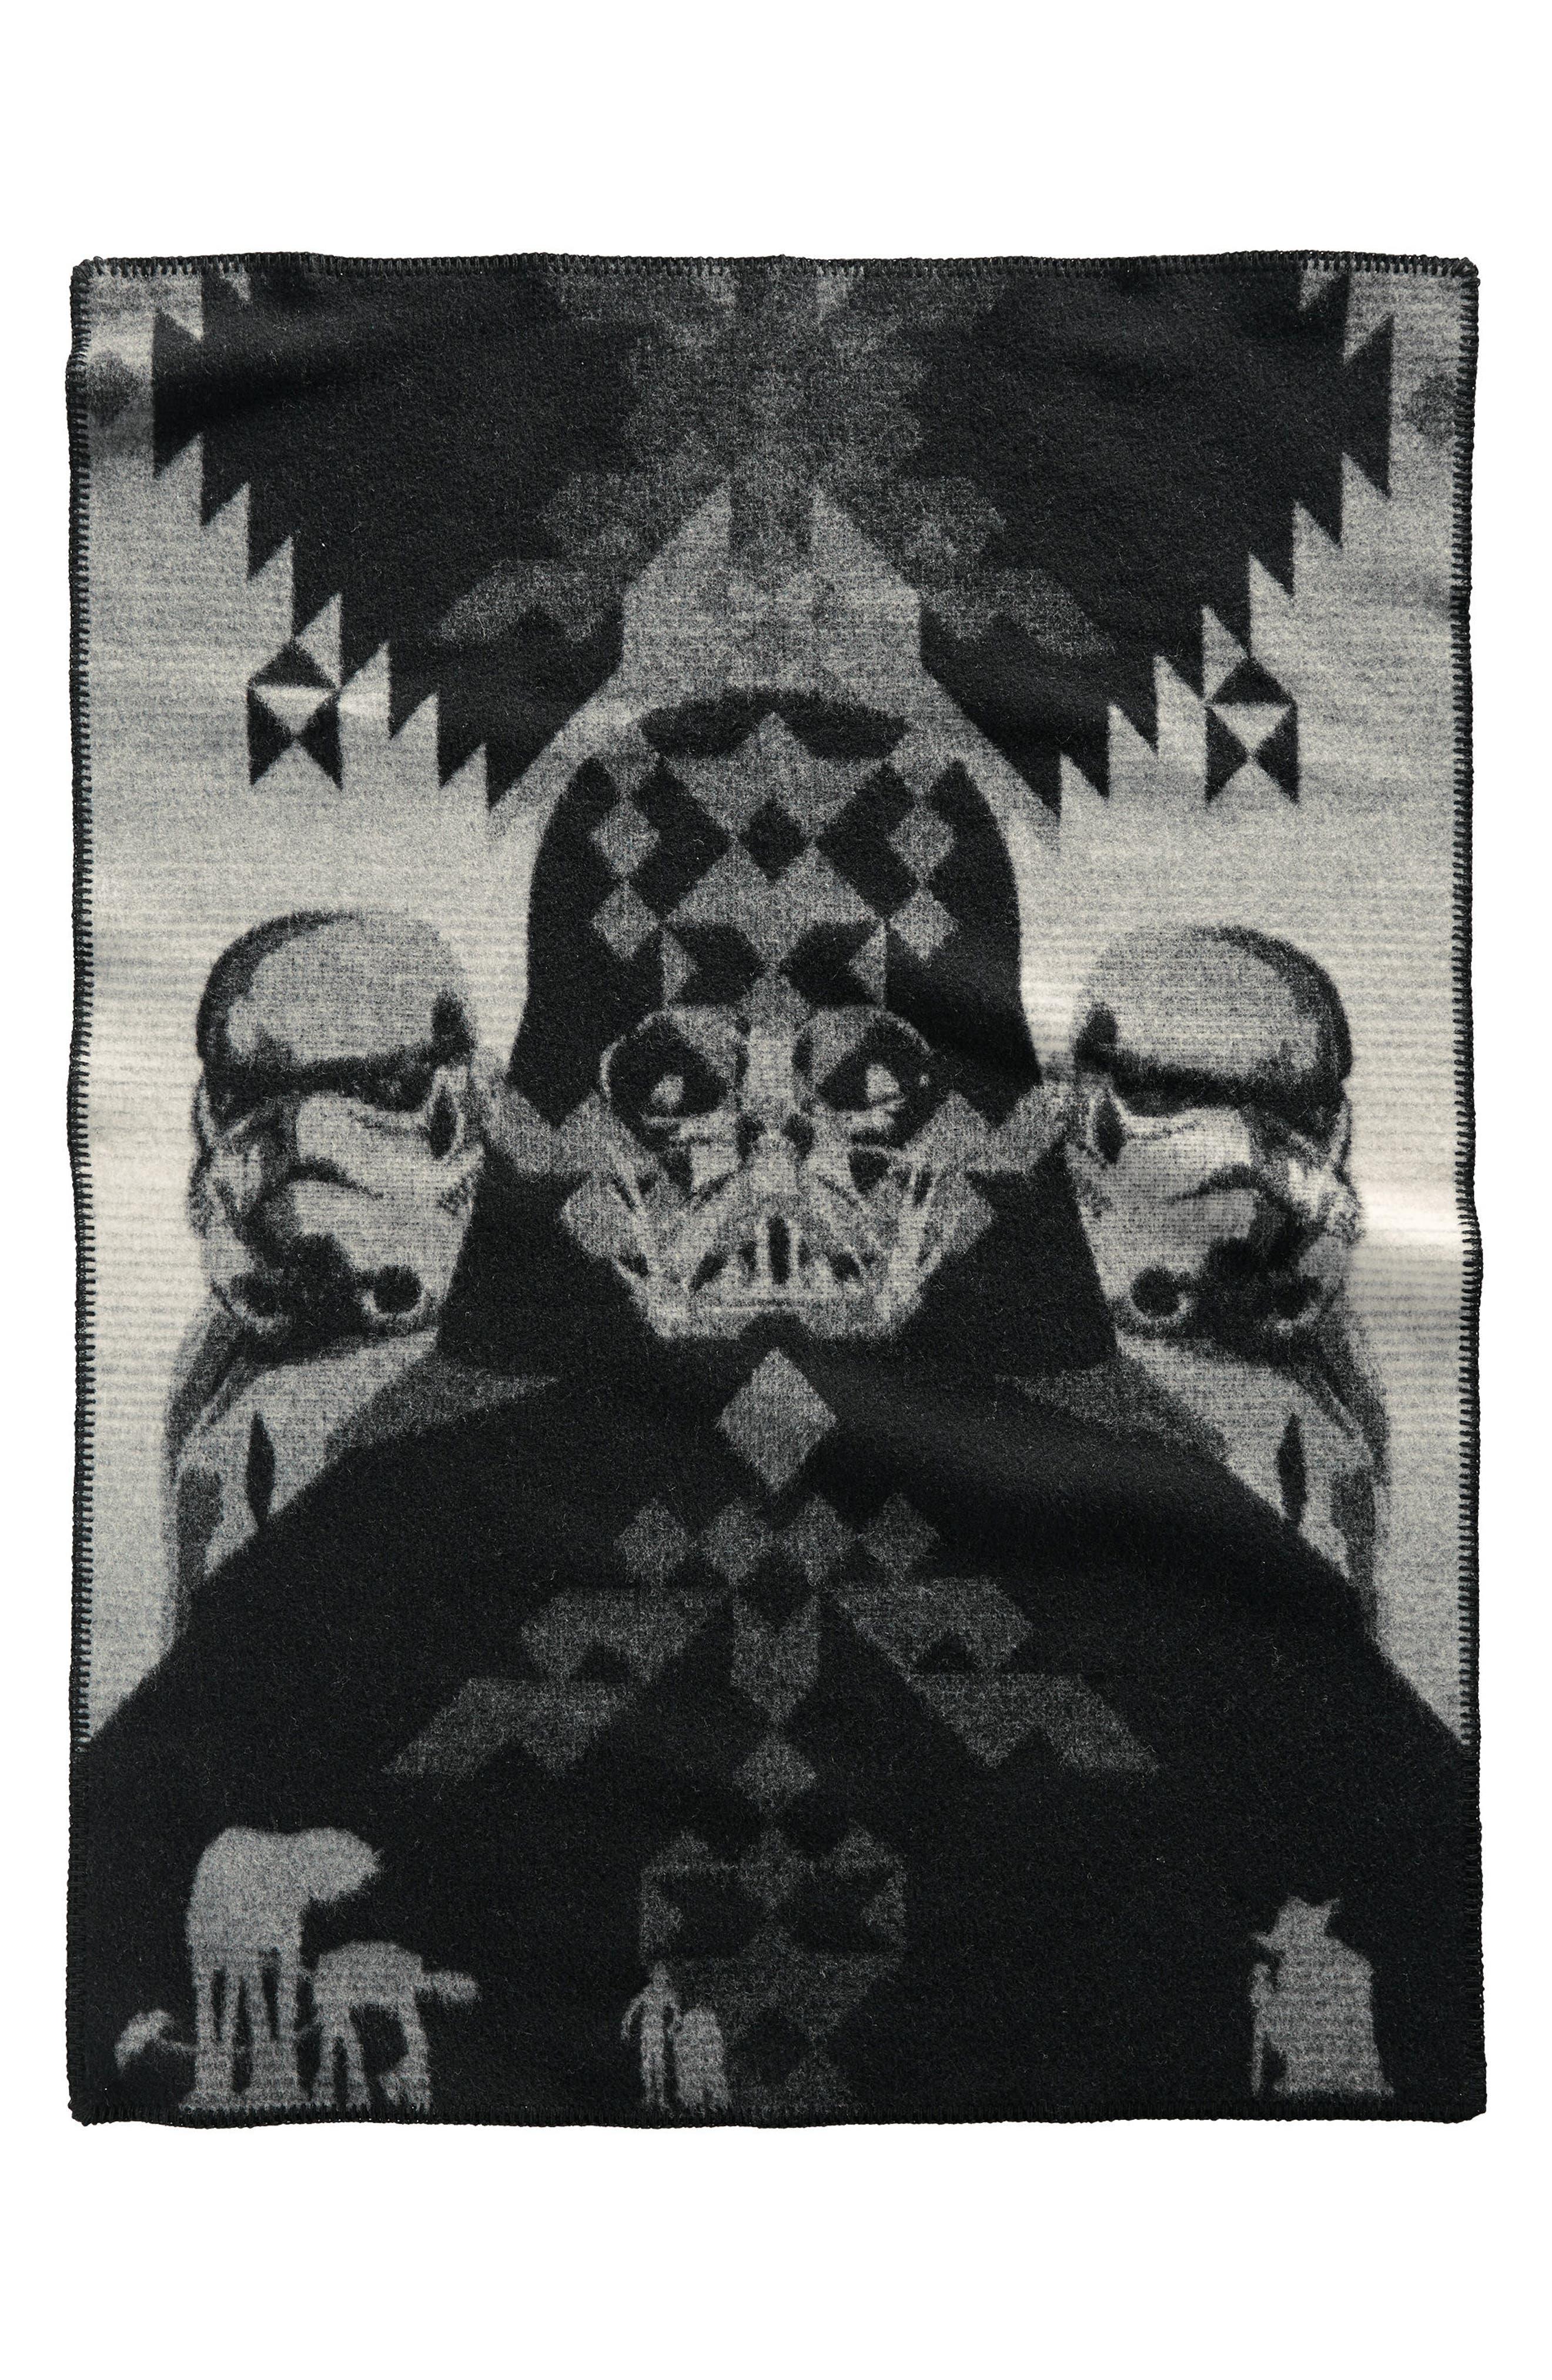 Alternate Image 1 Selected - Pendleton Star Wars™ - The Empire Strikes Back Wool Blend Baby Blanket